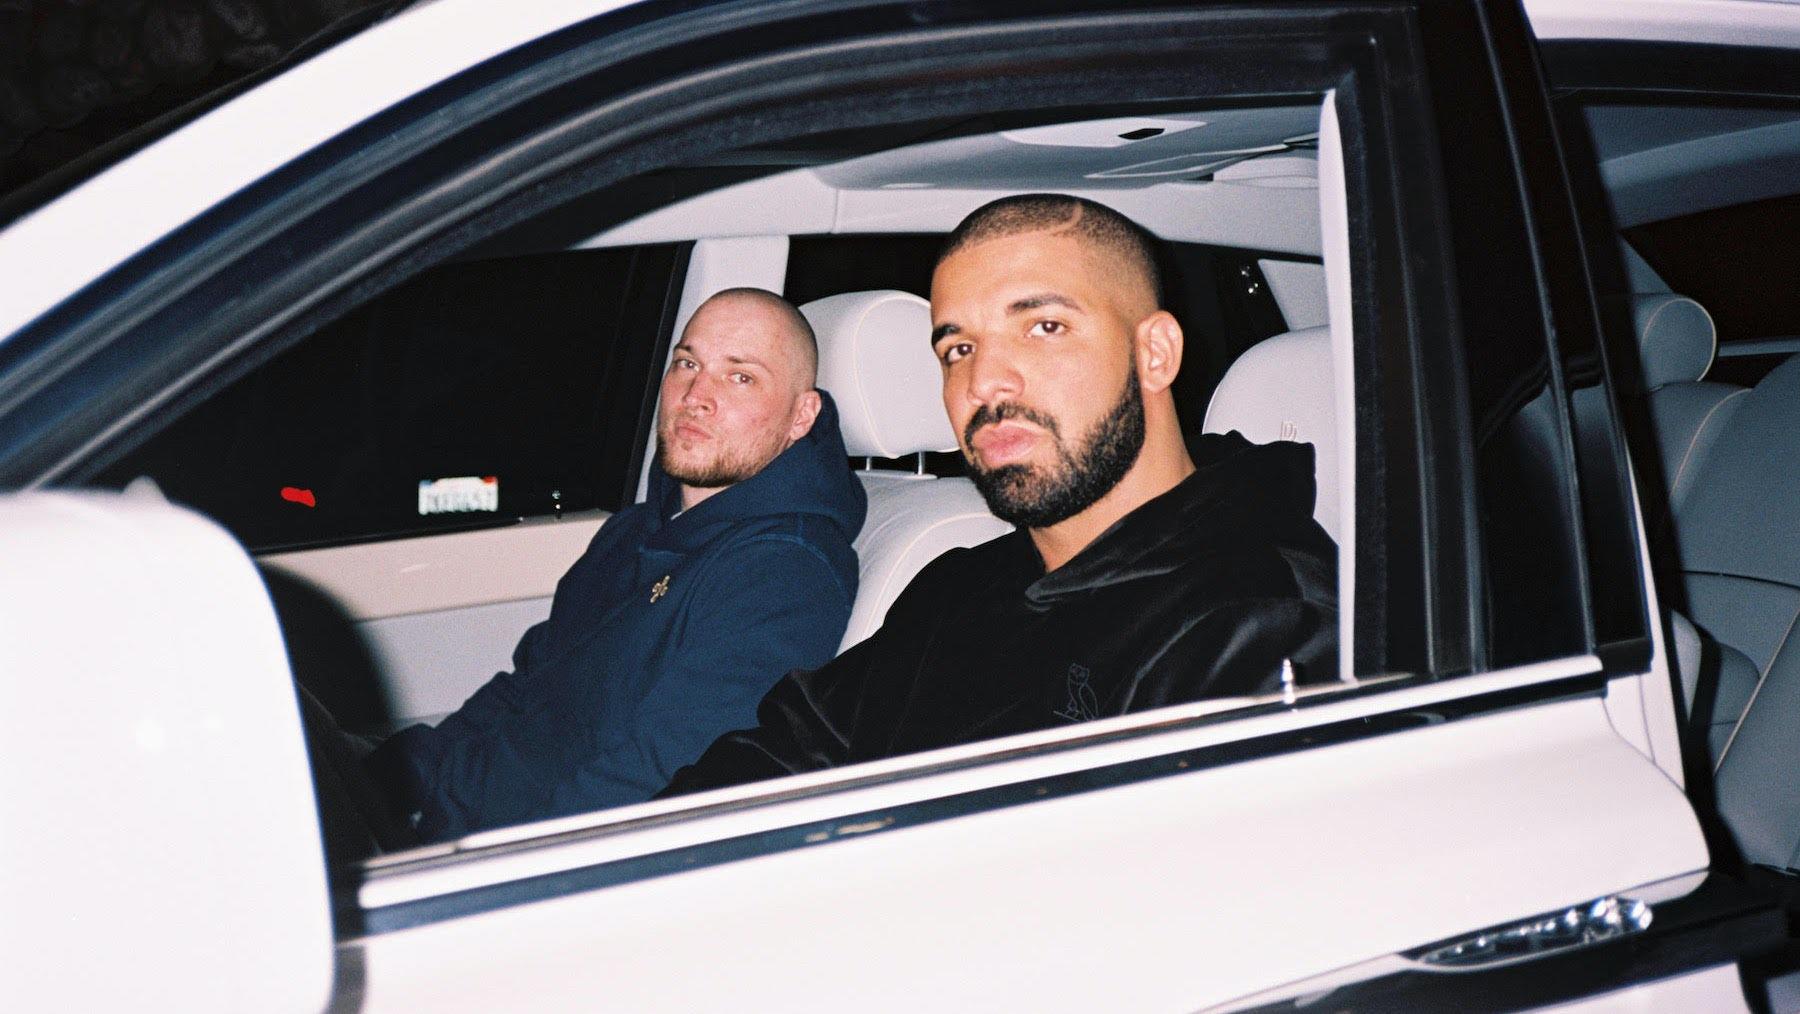 OVO's Oliver El-Khatib and Drake | Source: Jim Joe